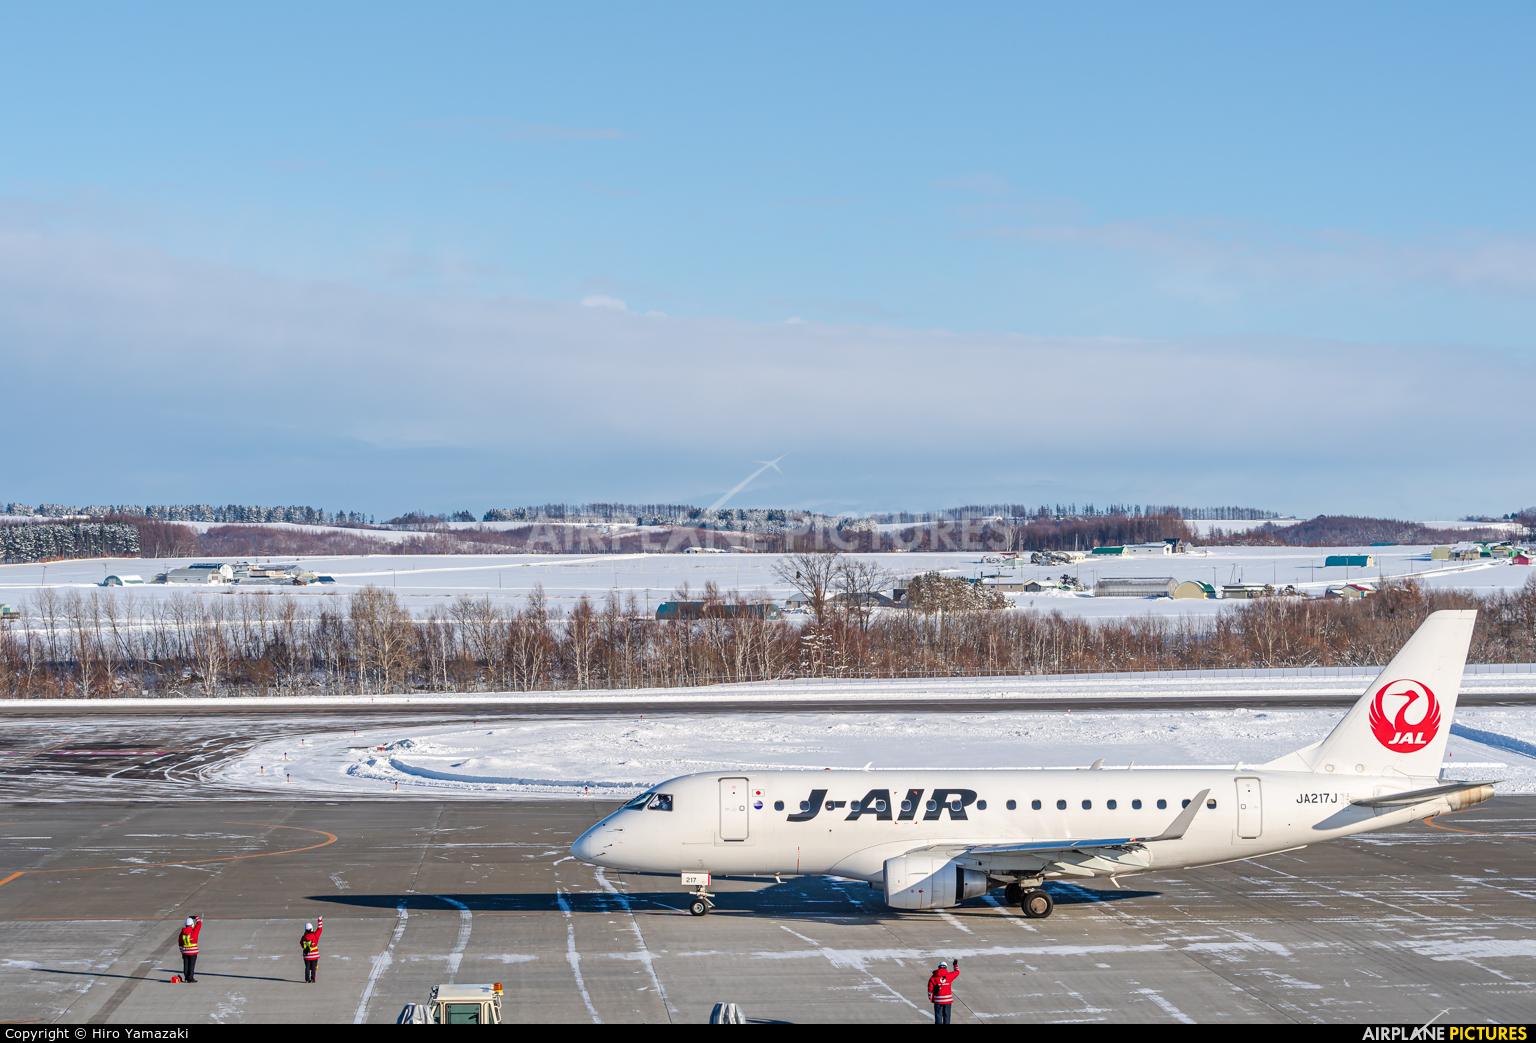 J-Air JA217J aircraft at Memanbetsu